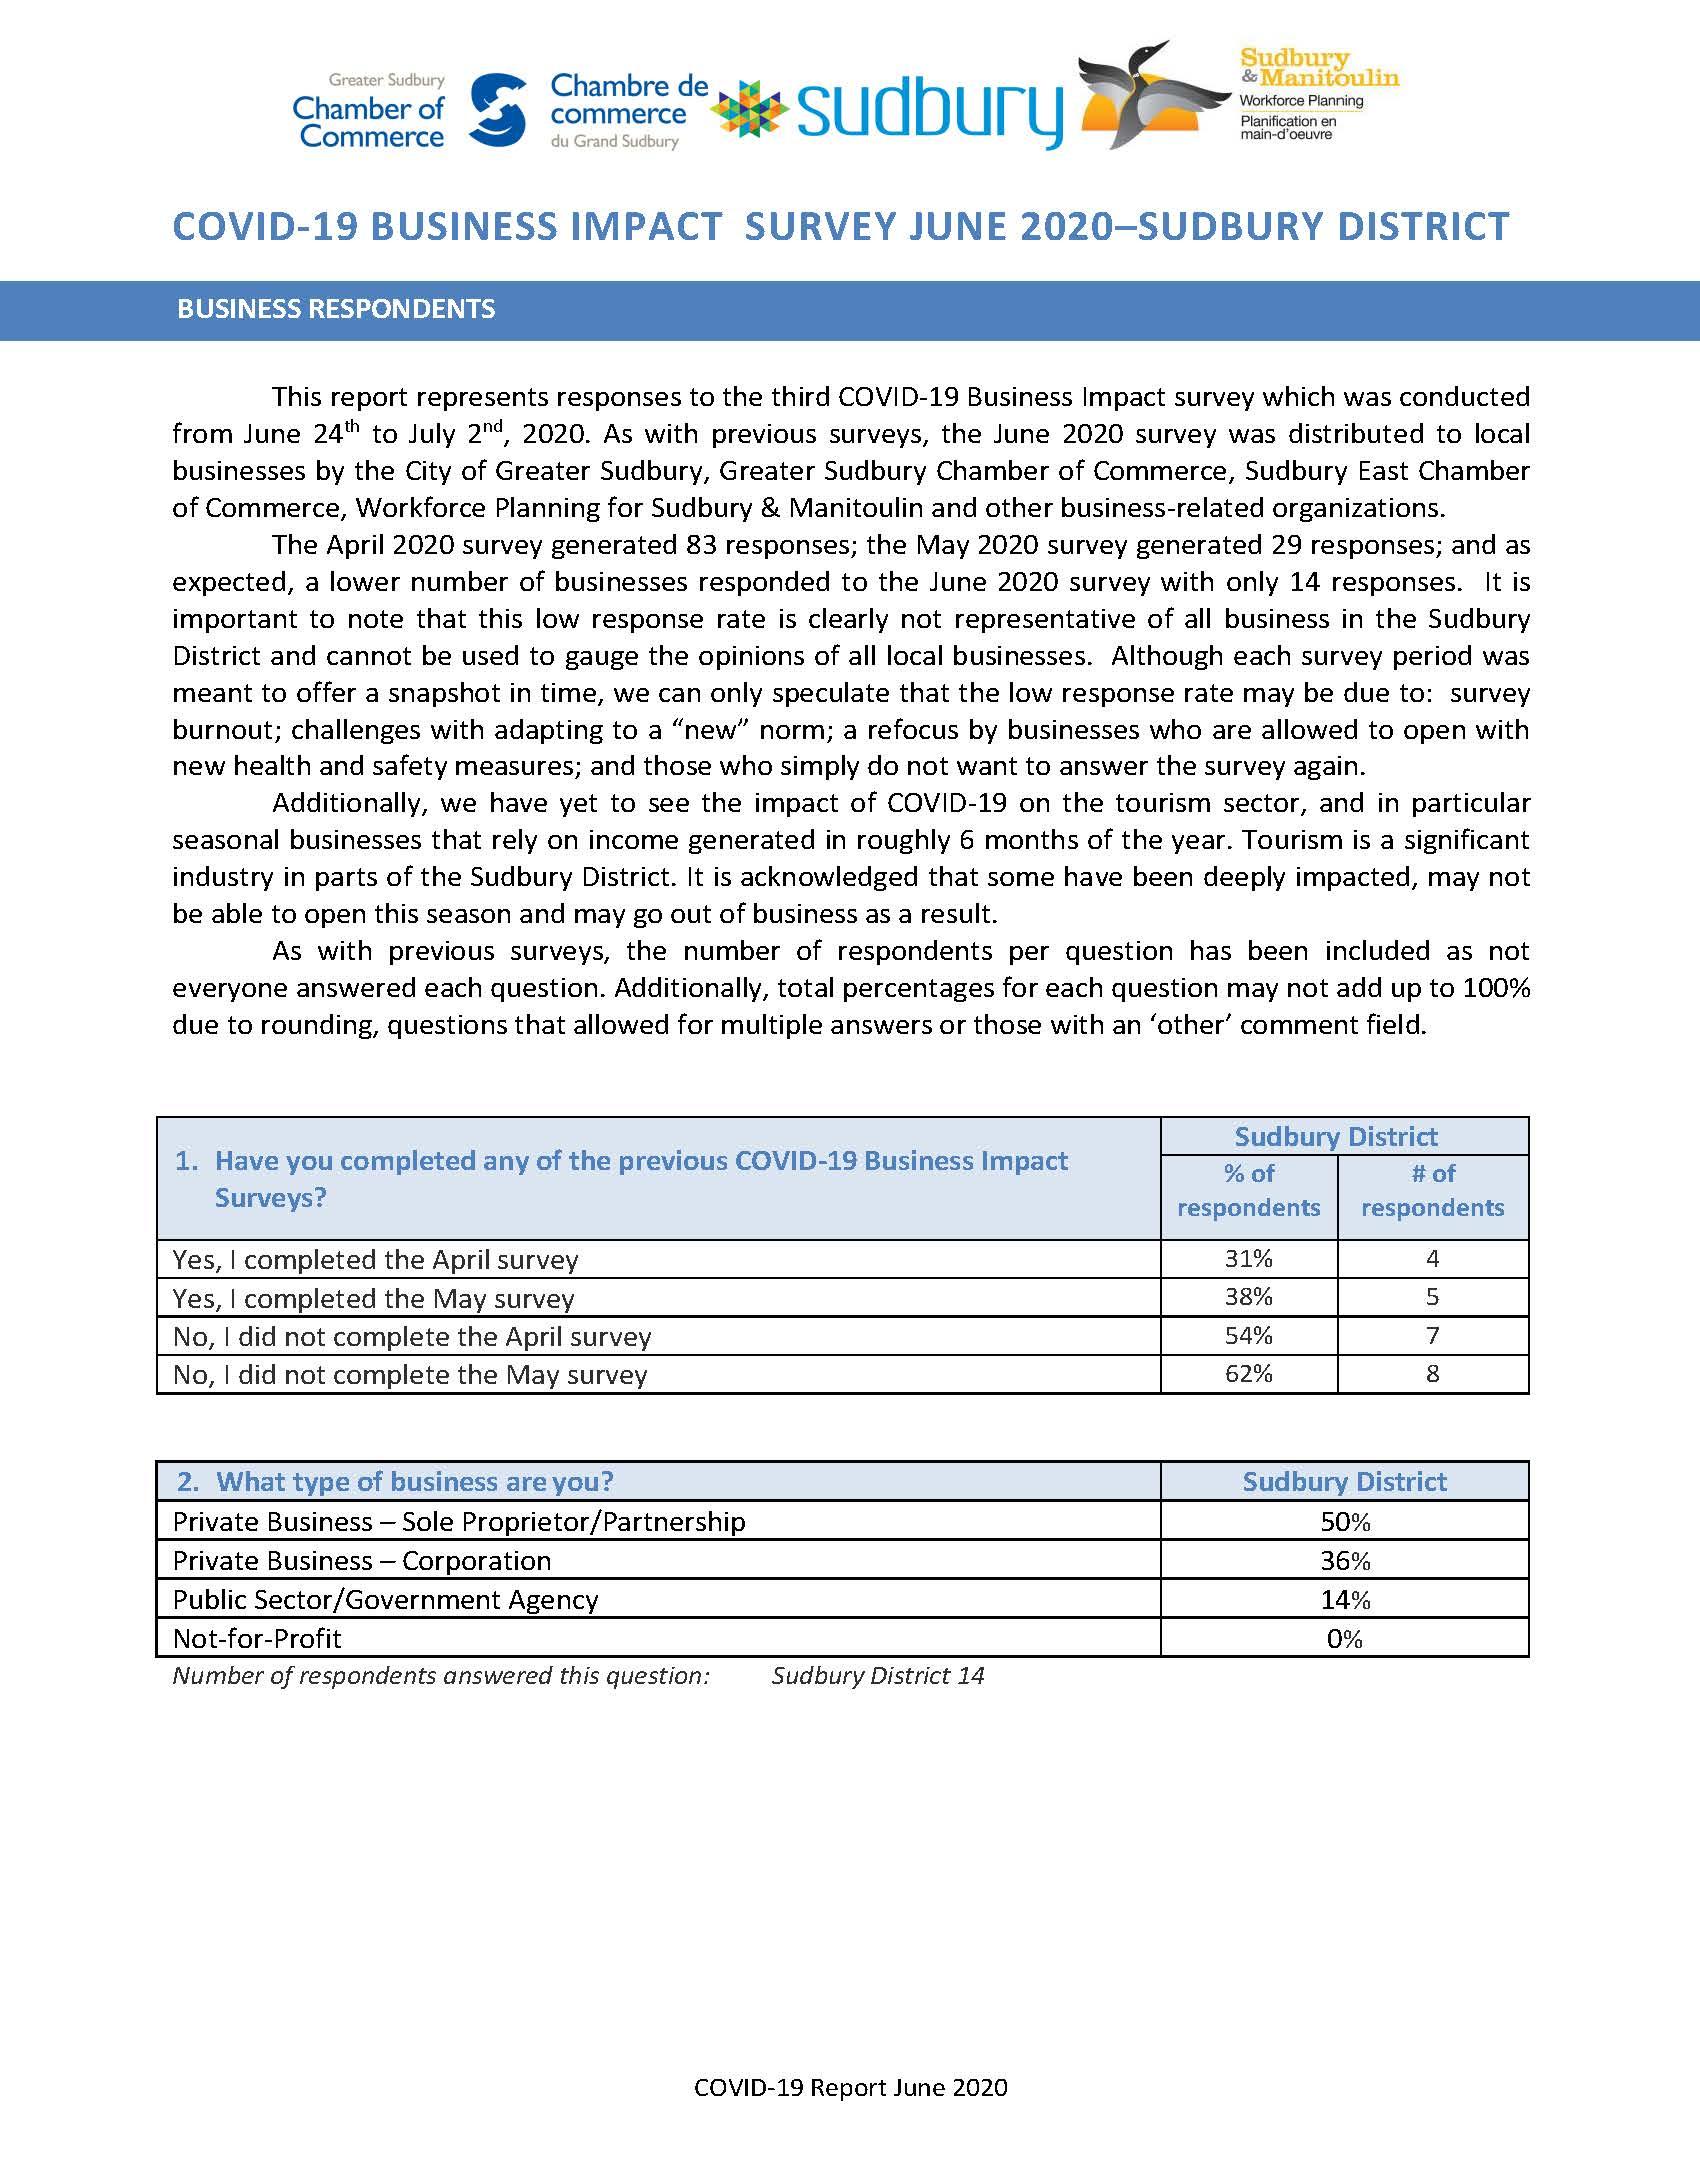 Annual Online Job Vacancies Report